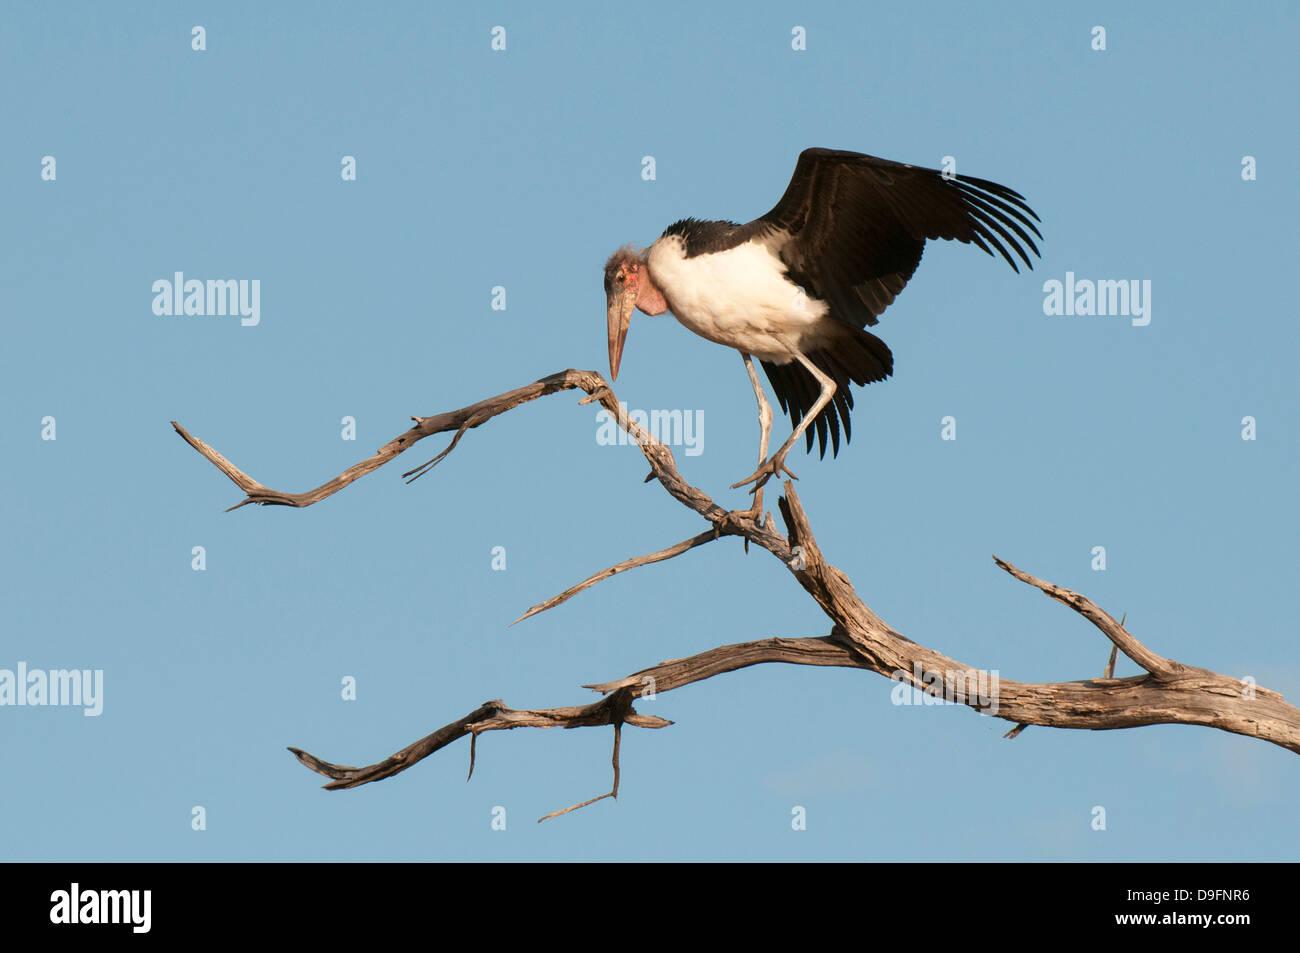 Marabou stork (Leptoptilos crumeniferus), Chobe National Park, Botswana, Africa - Stock Image